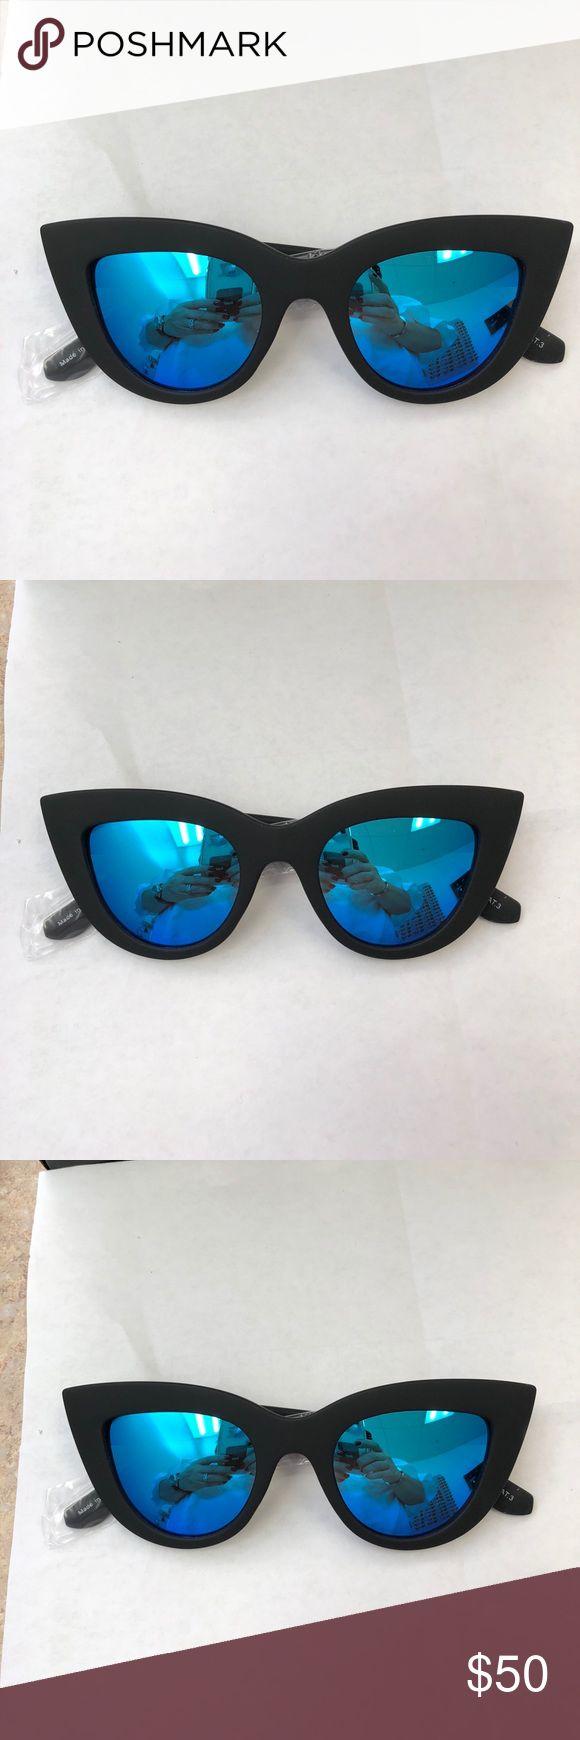 Quay sunglasses kitti Quay Australia sunglasses kitti black blue Quay Australia Accessories Sunglasses